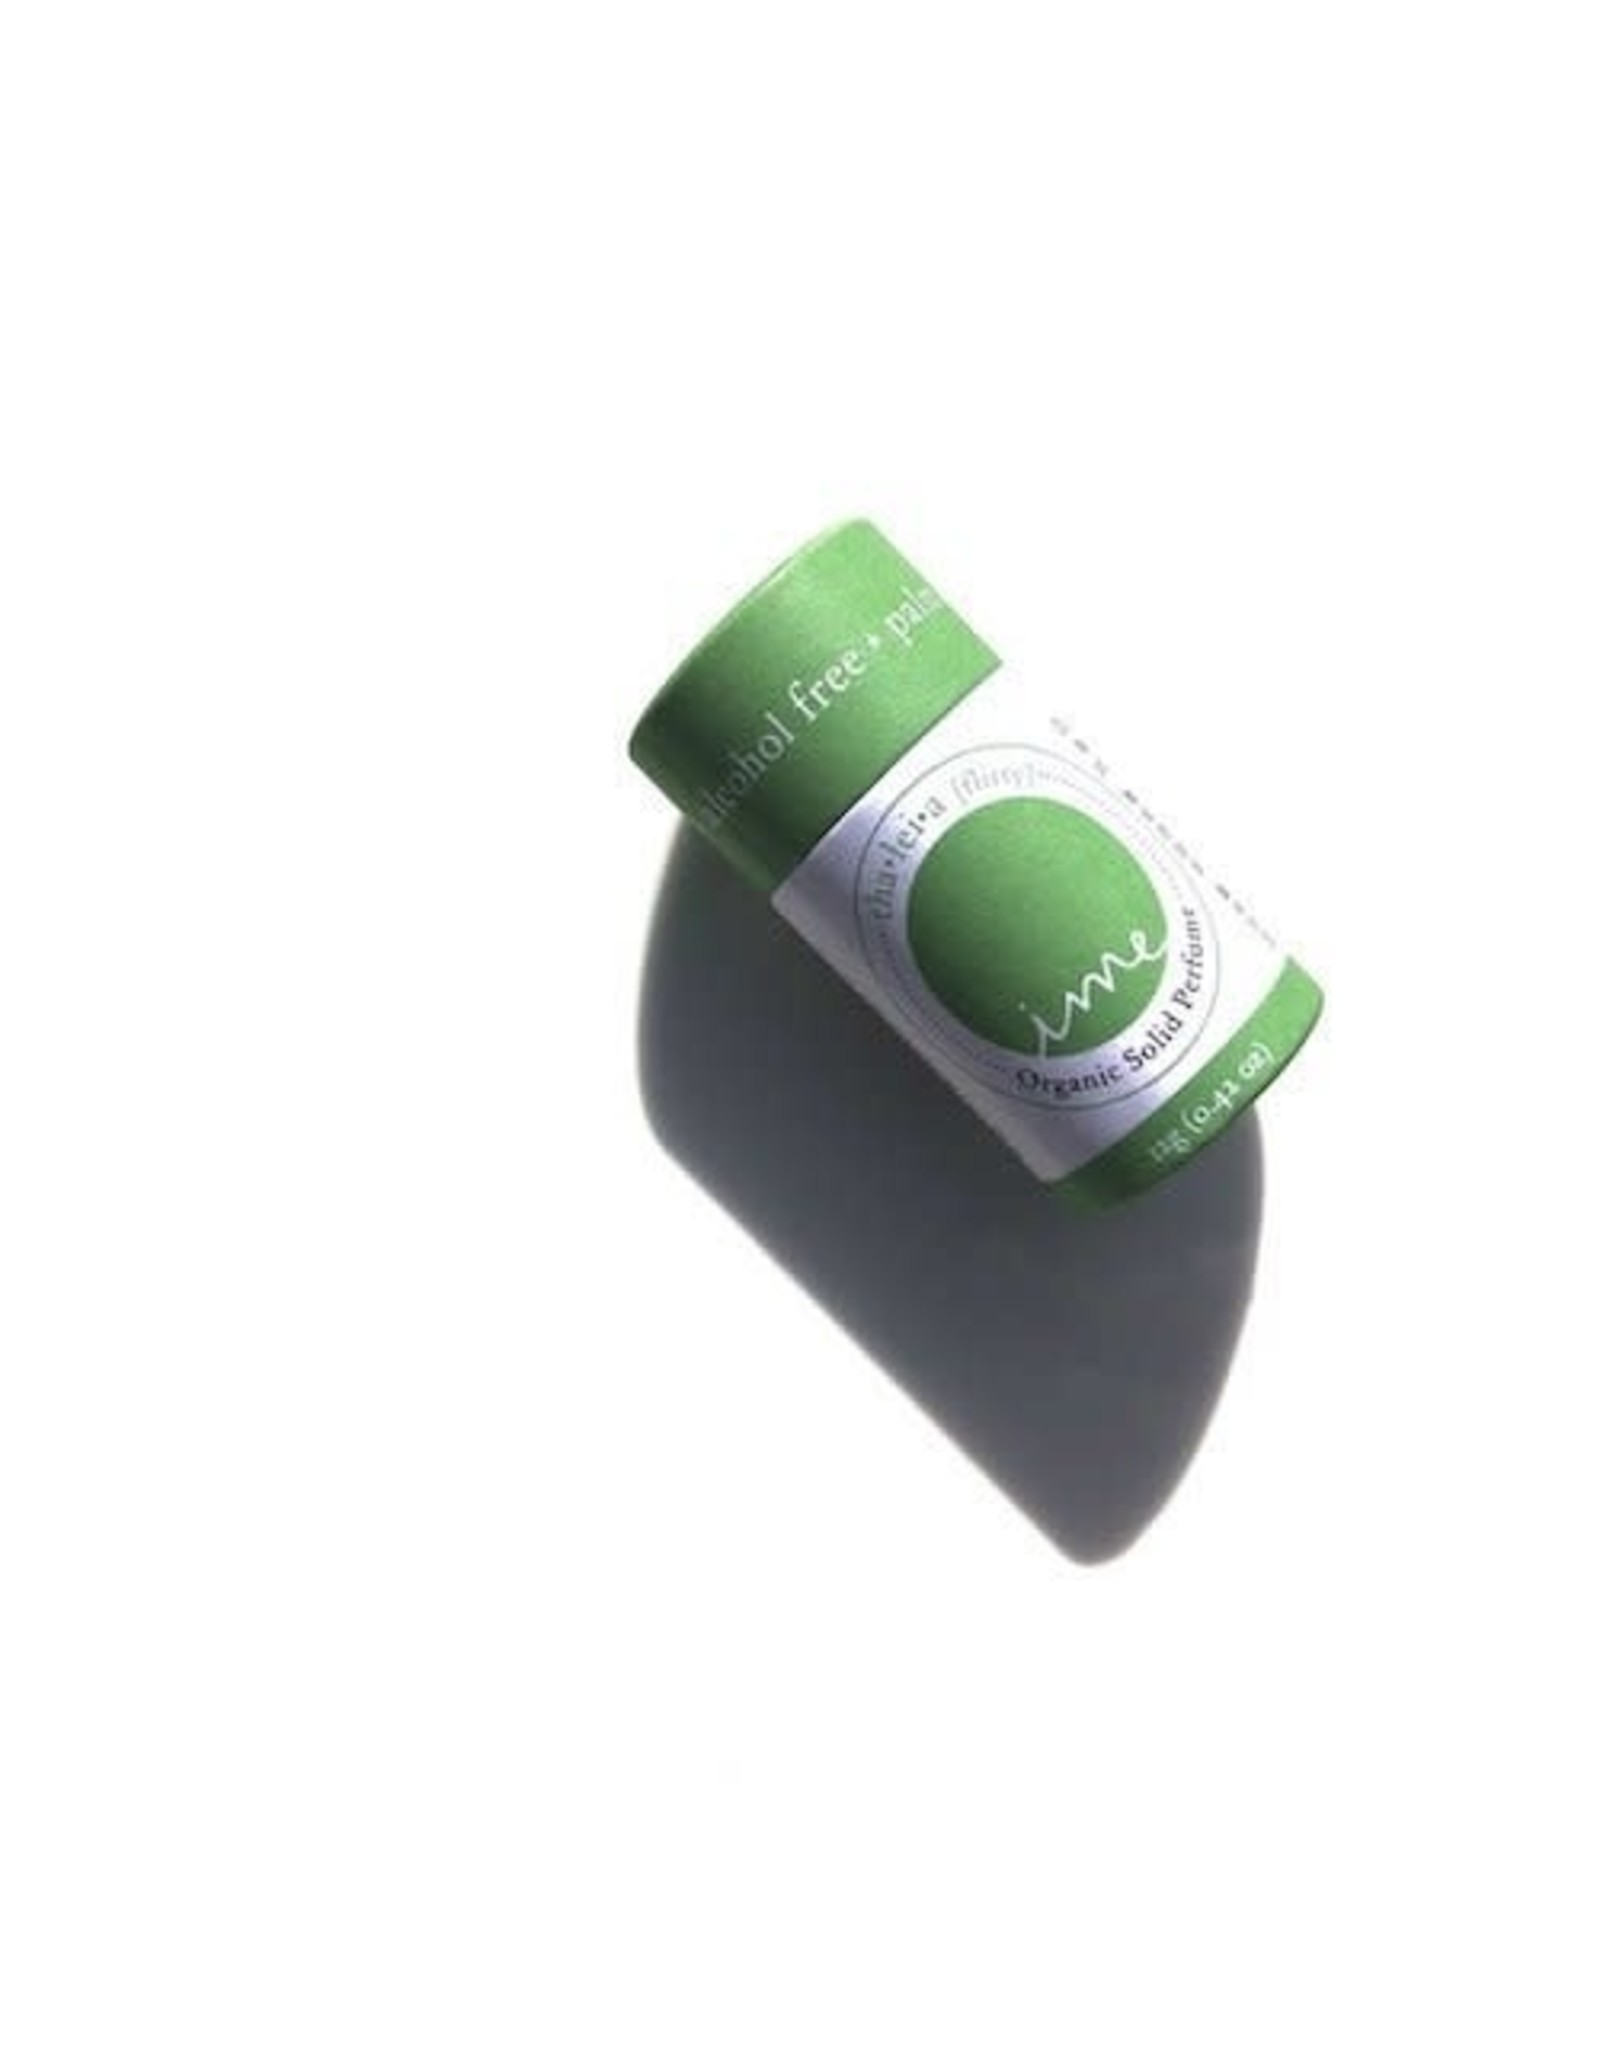 IME Solid Perfume - Thaleia (Flirty) - 12g